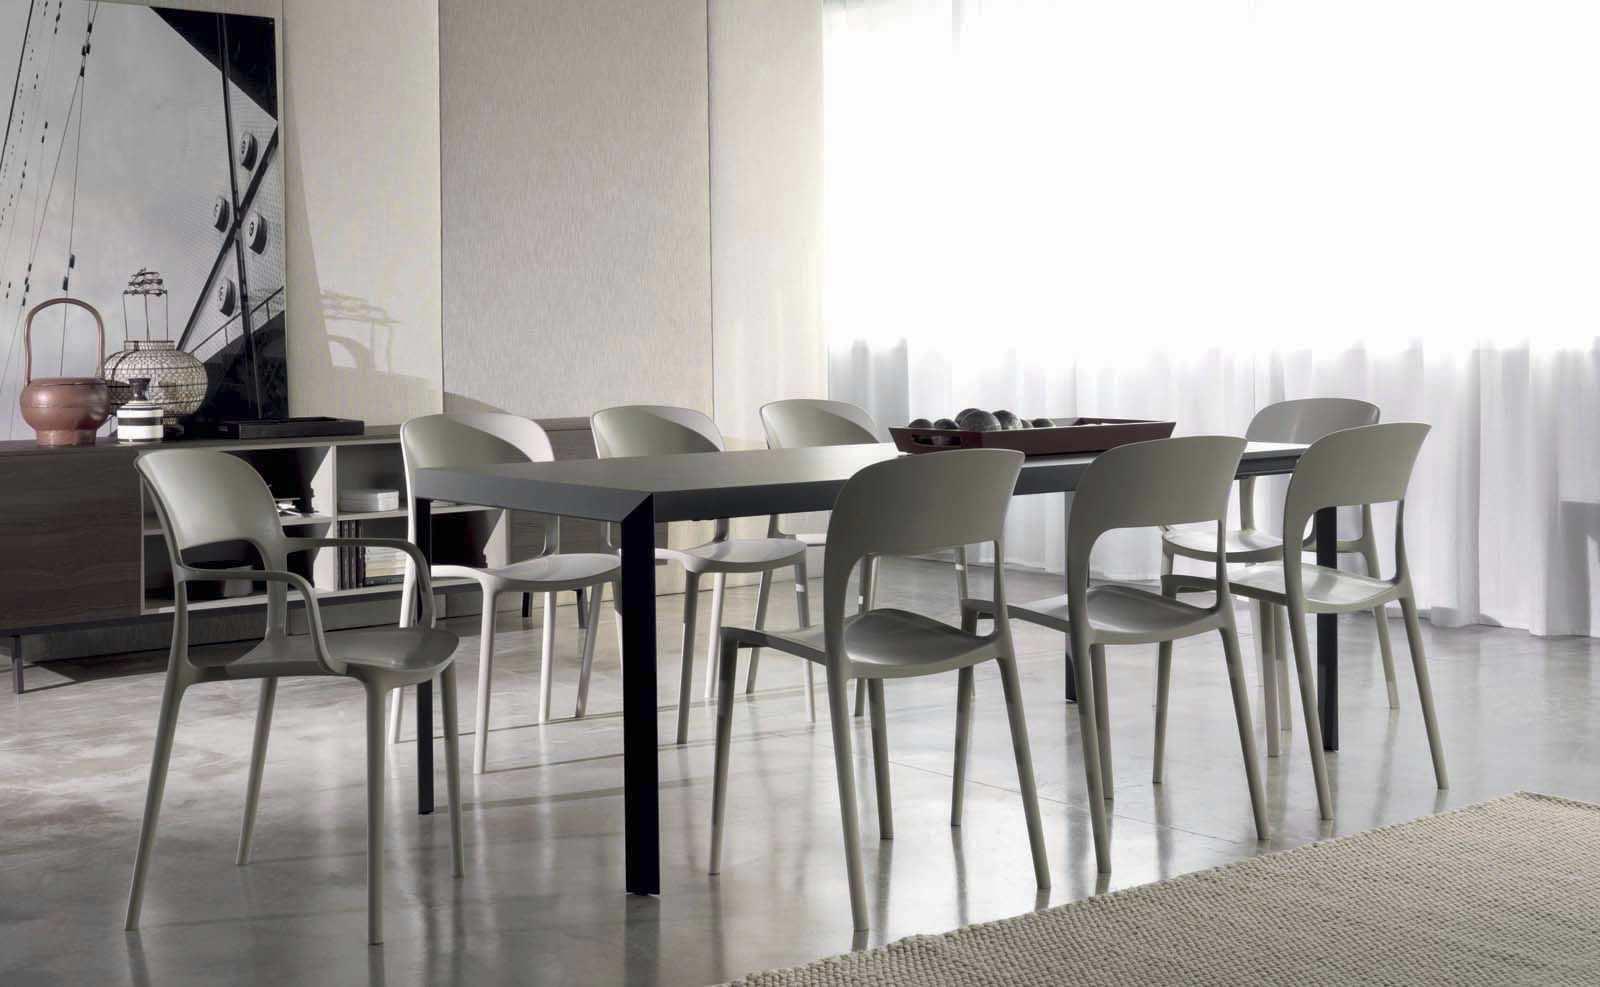 Sedia bontempi polipropilene sedie bontempi prezzi aqua coppia